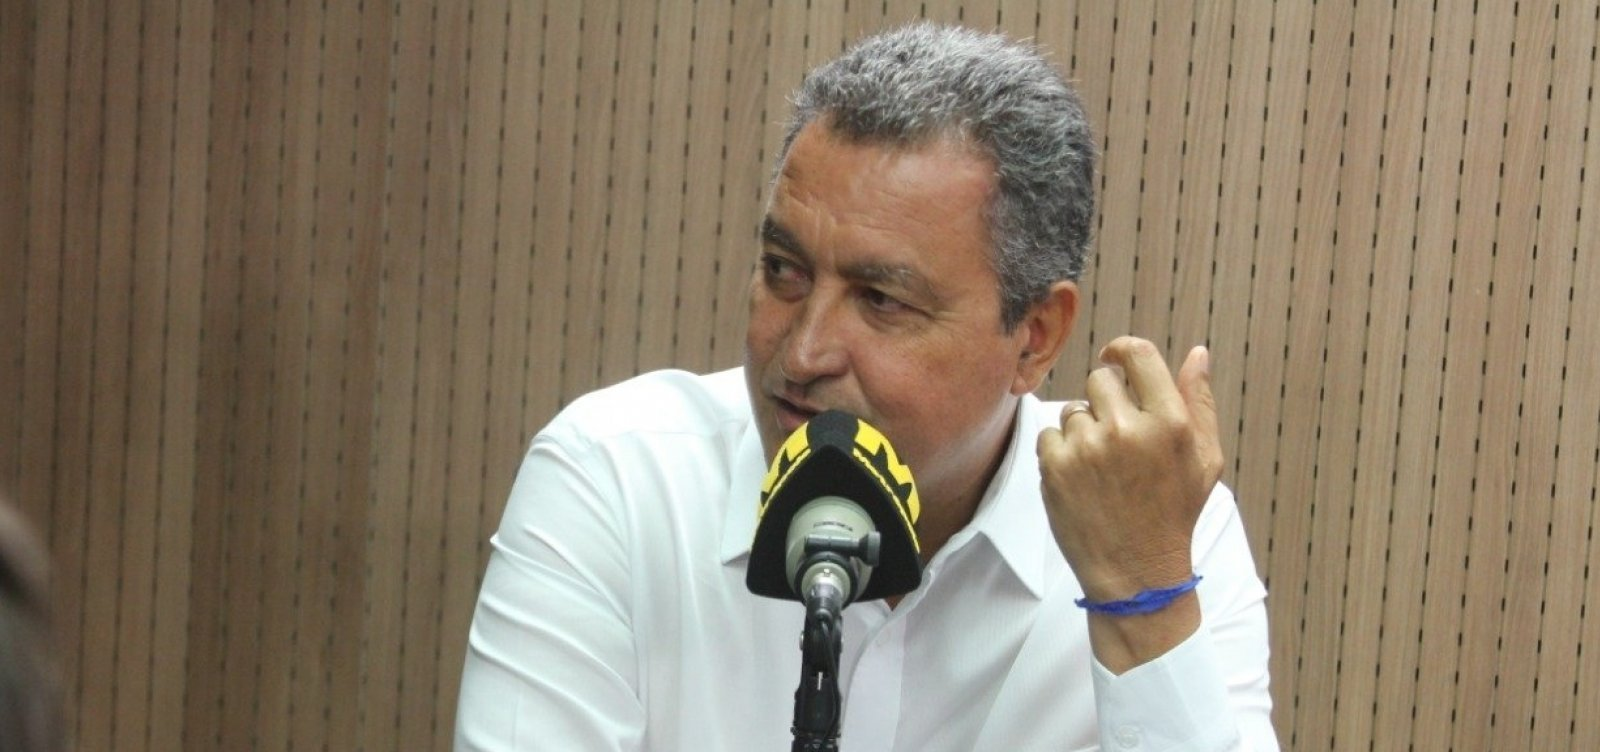 Ouça a entrevista exclusiva do Governador Rui Costa na manhã desta segunda-feira